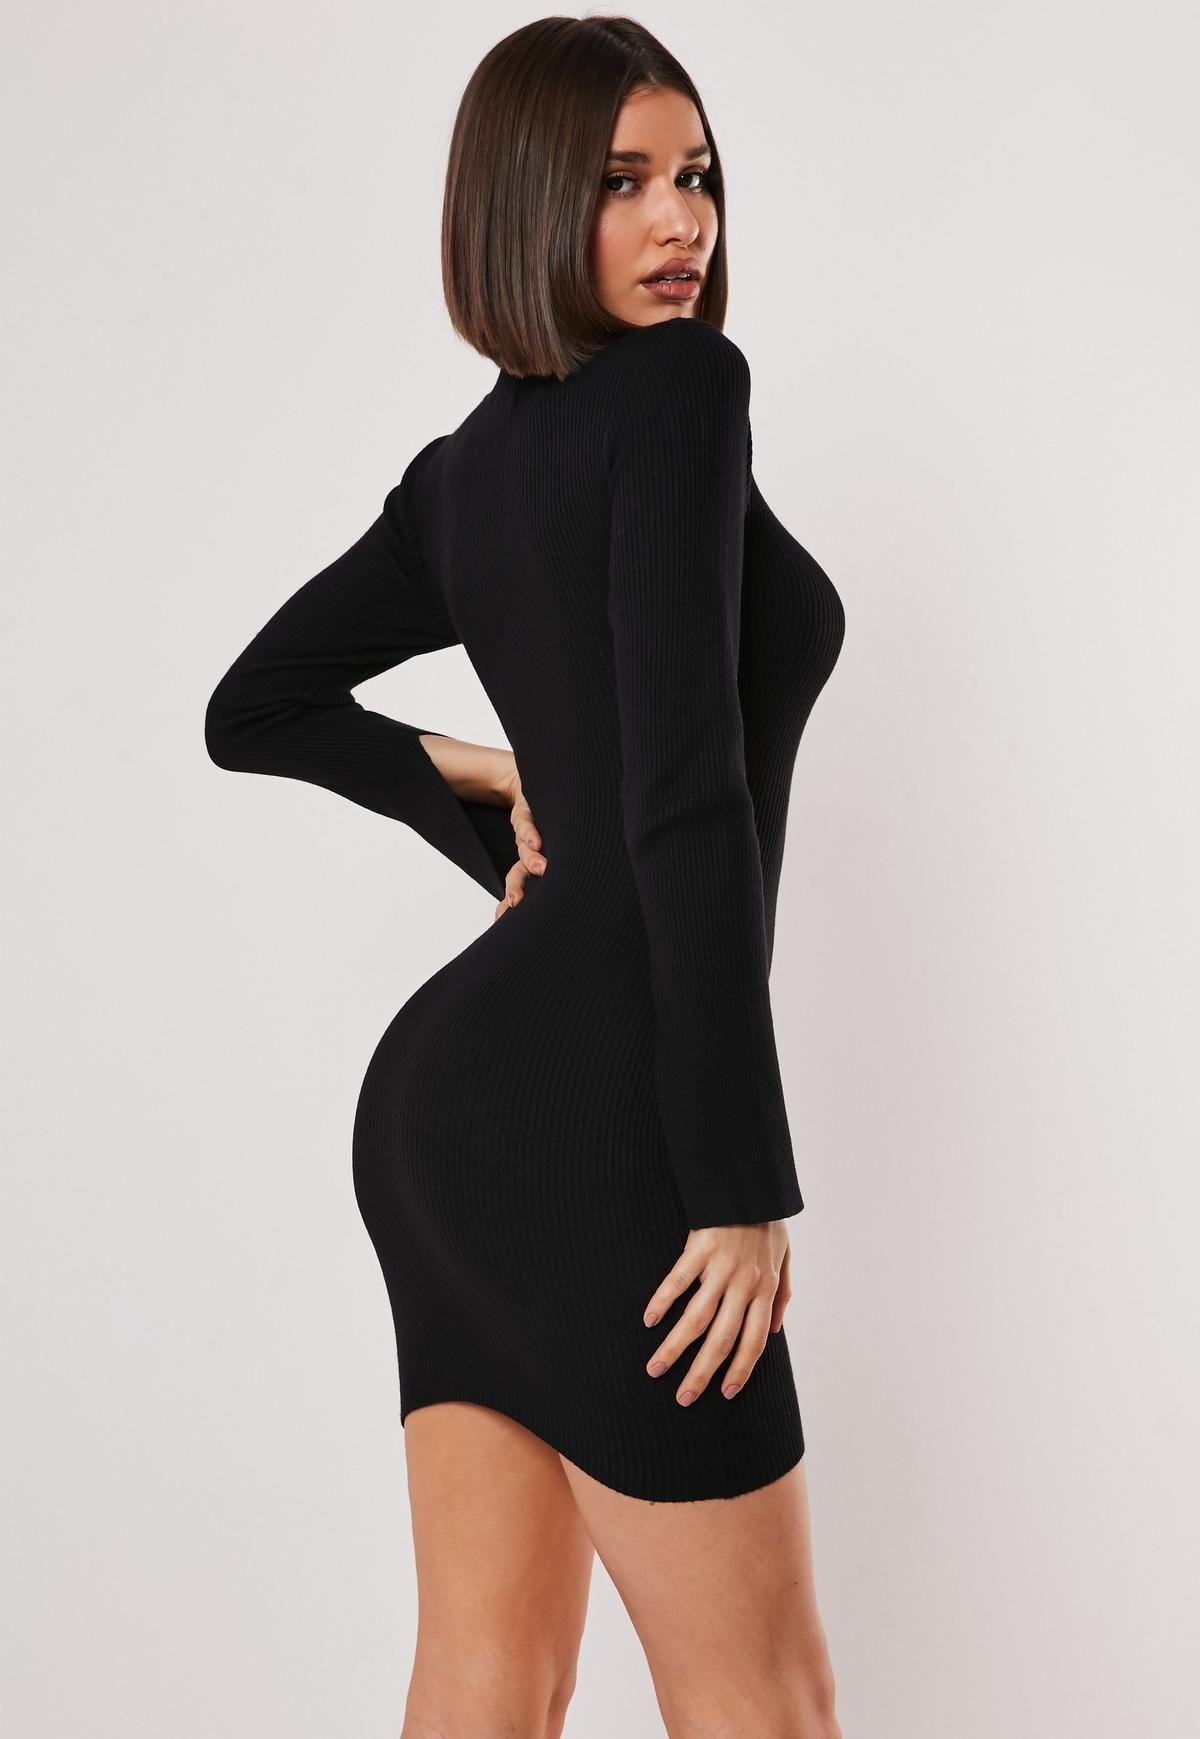 Black Long Sleeve Ribbed Sweater Dress Ribbed Sweater Dress Hot Pink Bodycon Dress Sweater Dress [ 1739 x 1200 Pixel ]